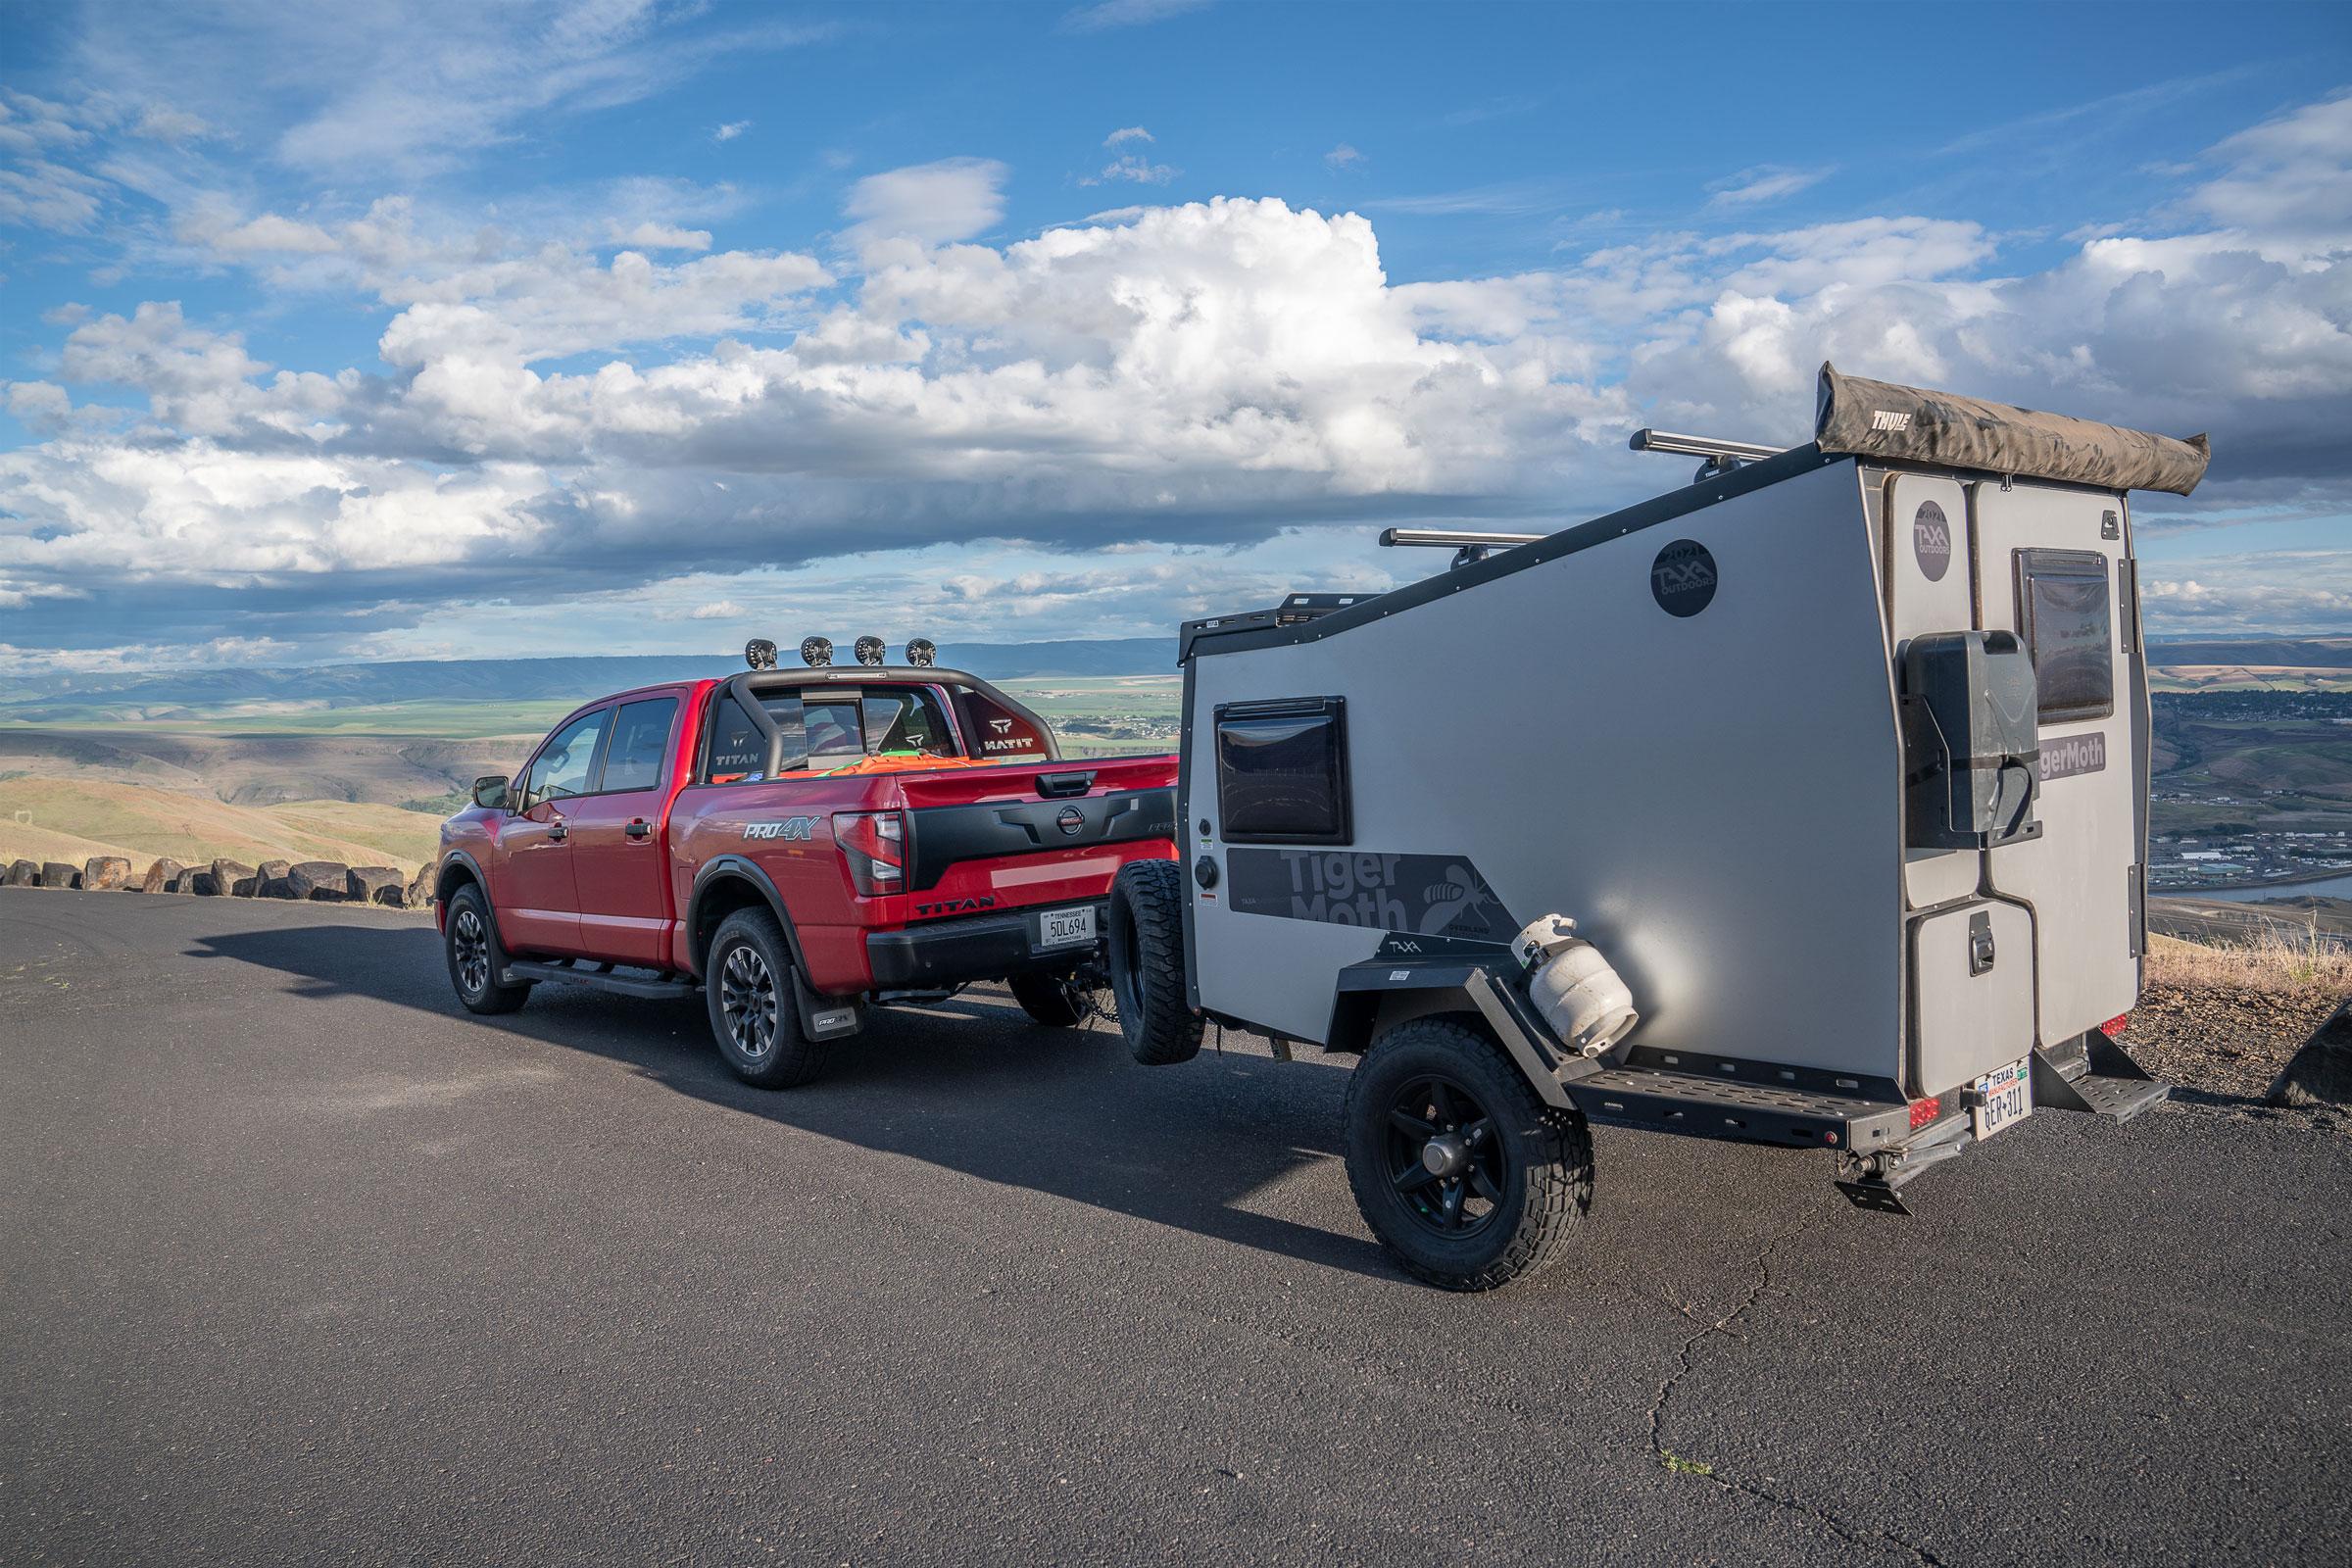 taxa outdoors tigermoth camper trailer